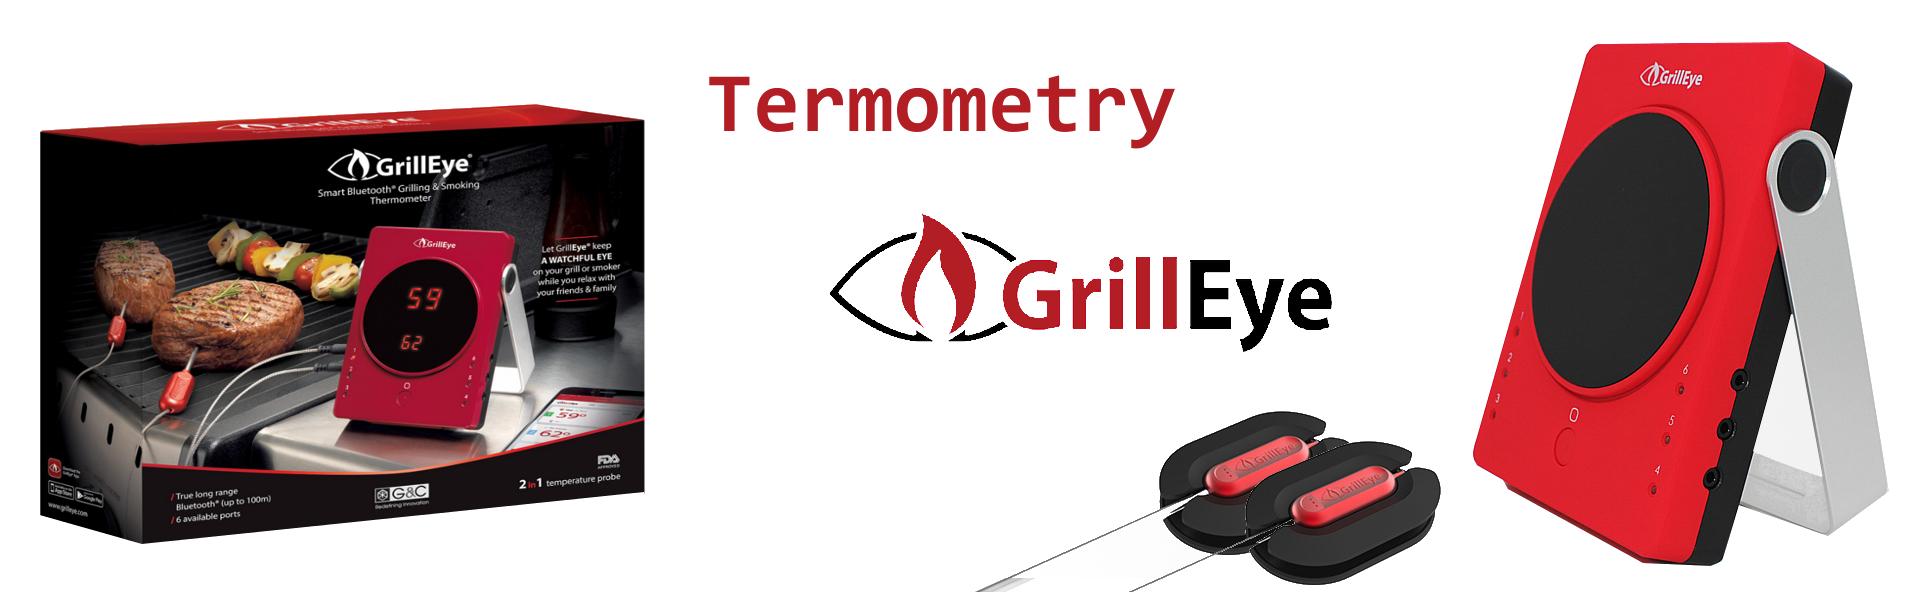 Termometr GrillEye